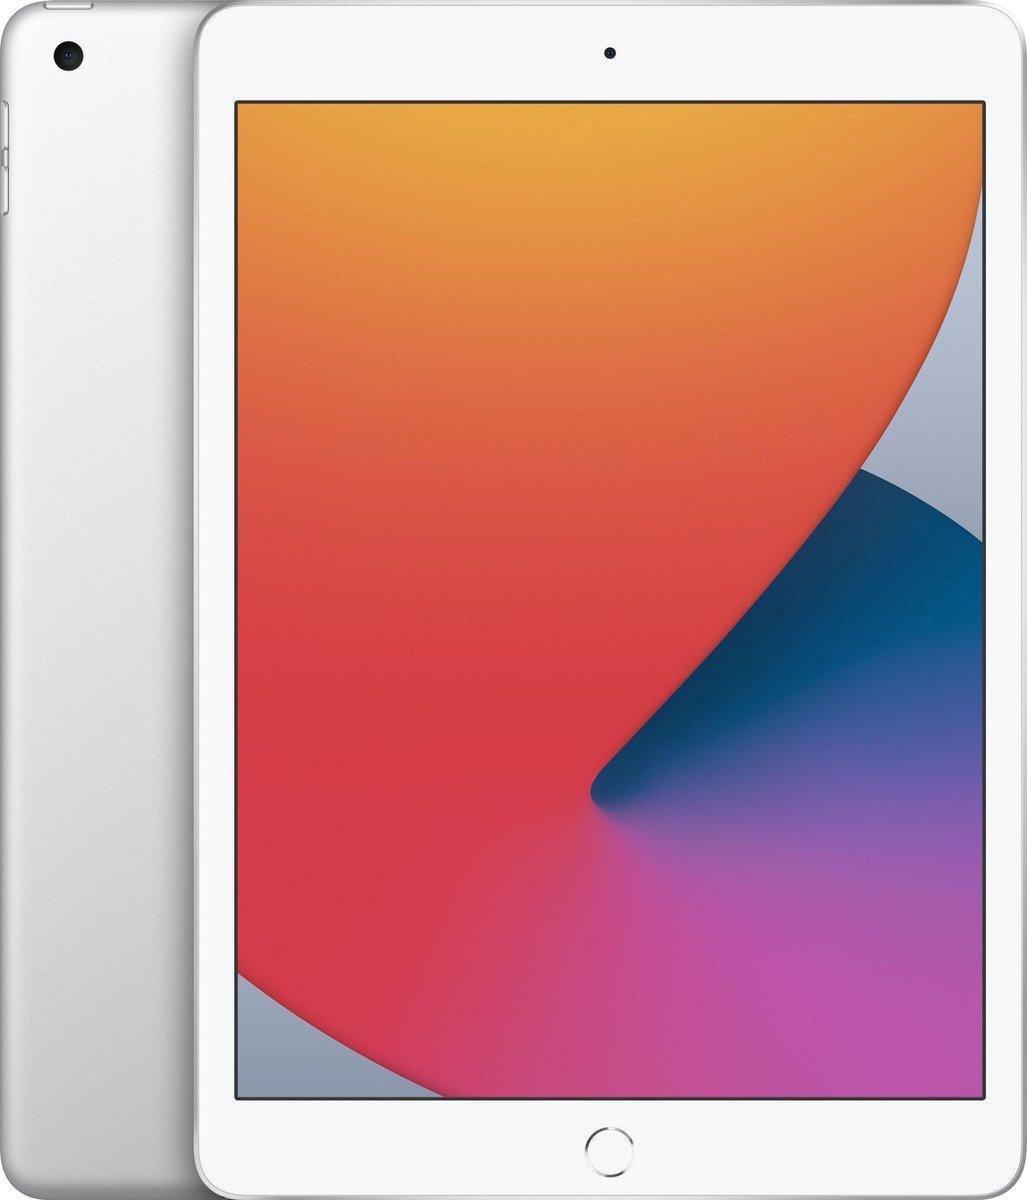 Apple iPad 2020 WiFi 128GB silver 10.2in 8th gen MYLE2HC/A